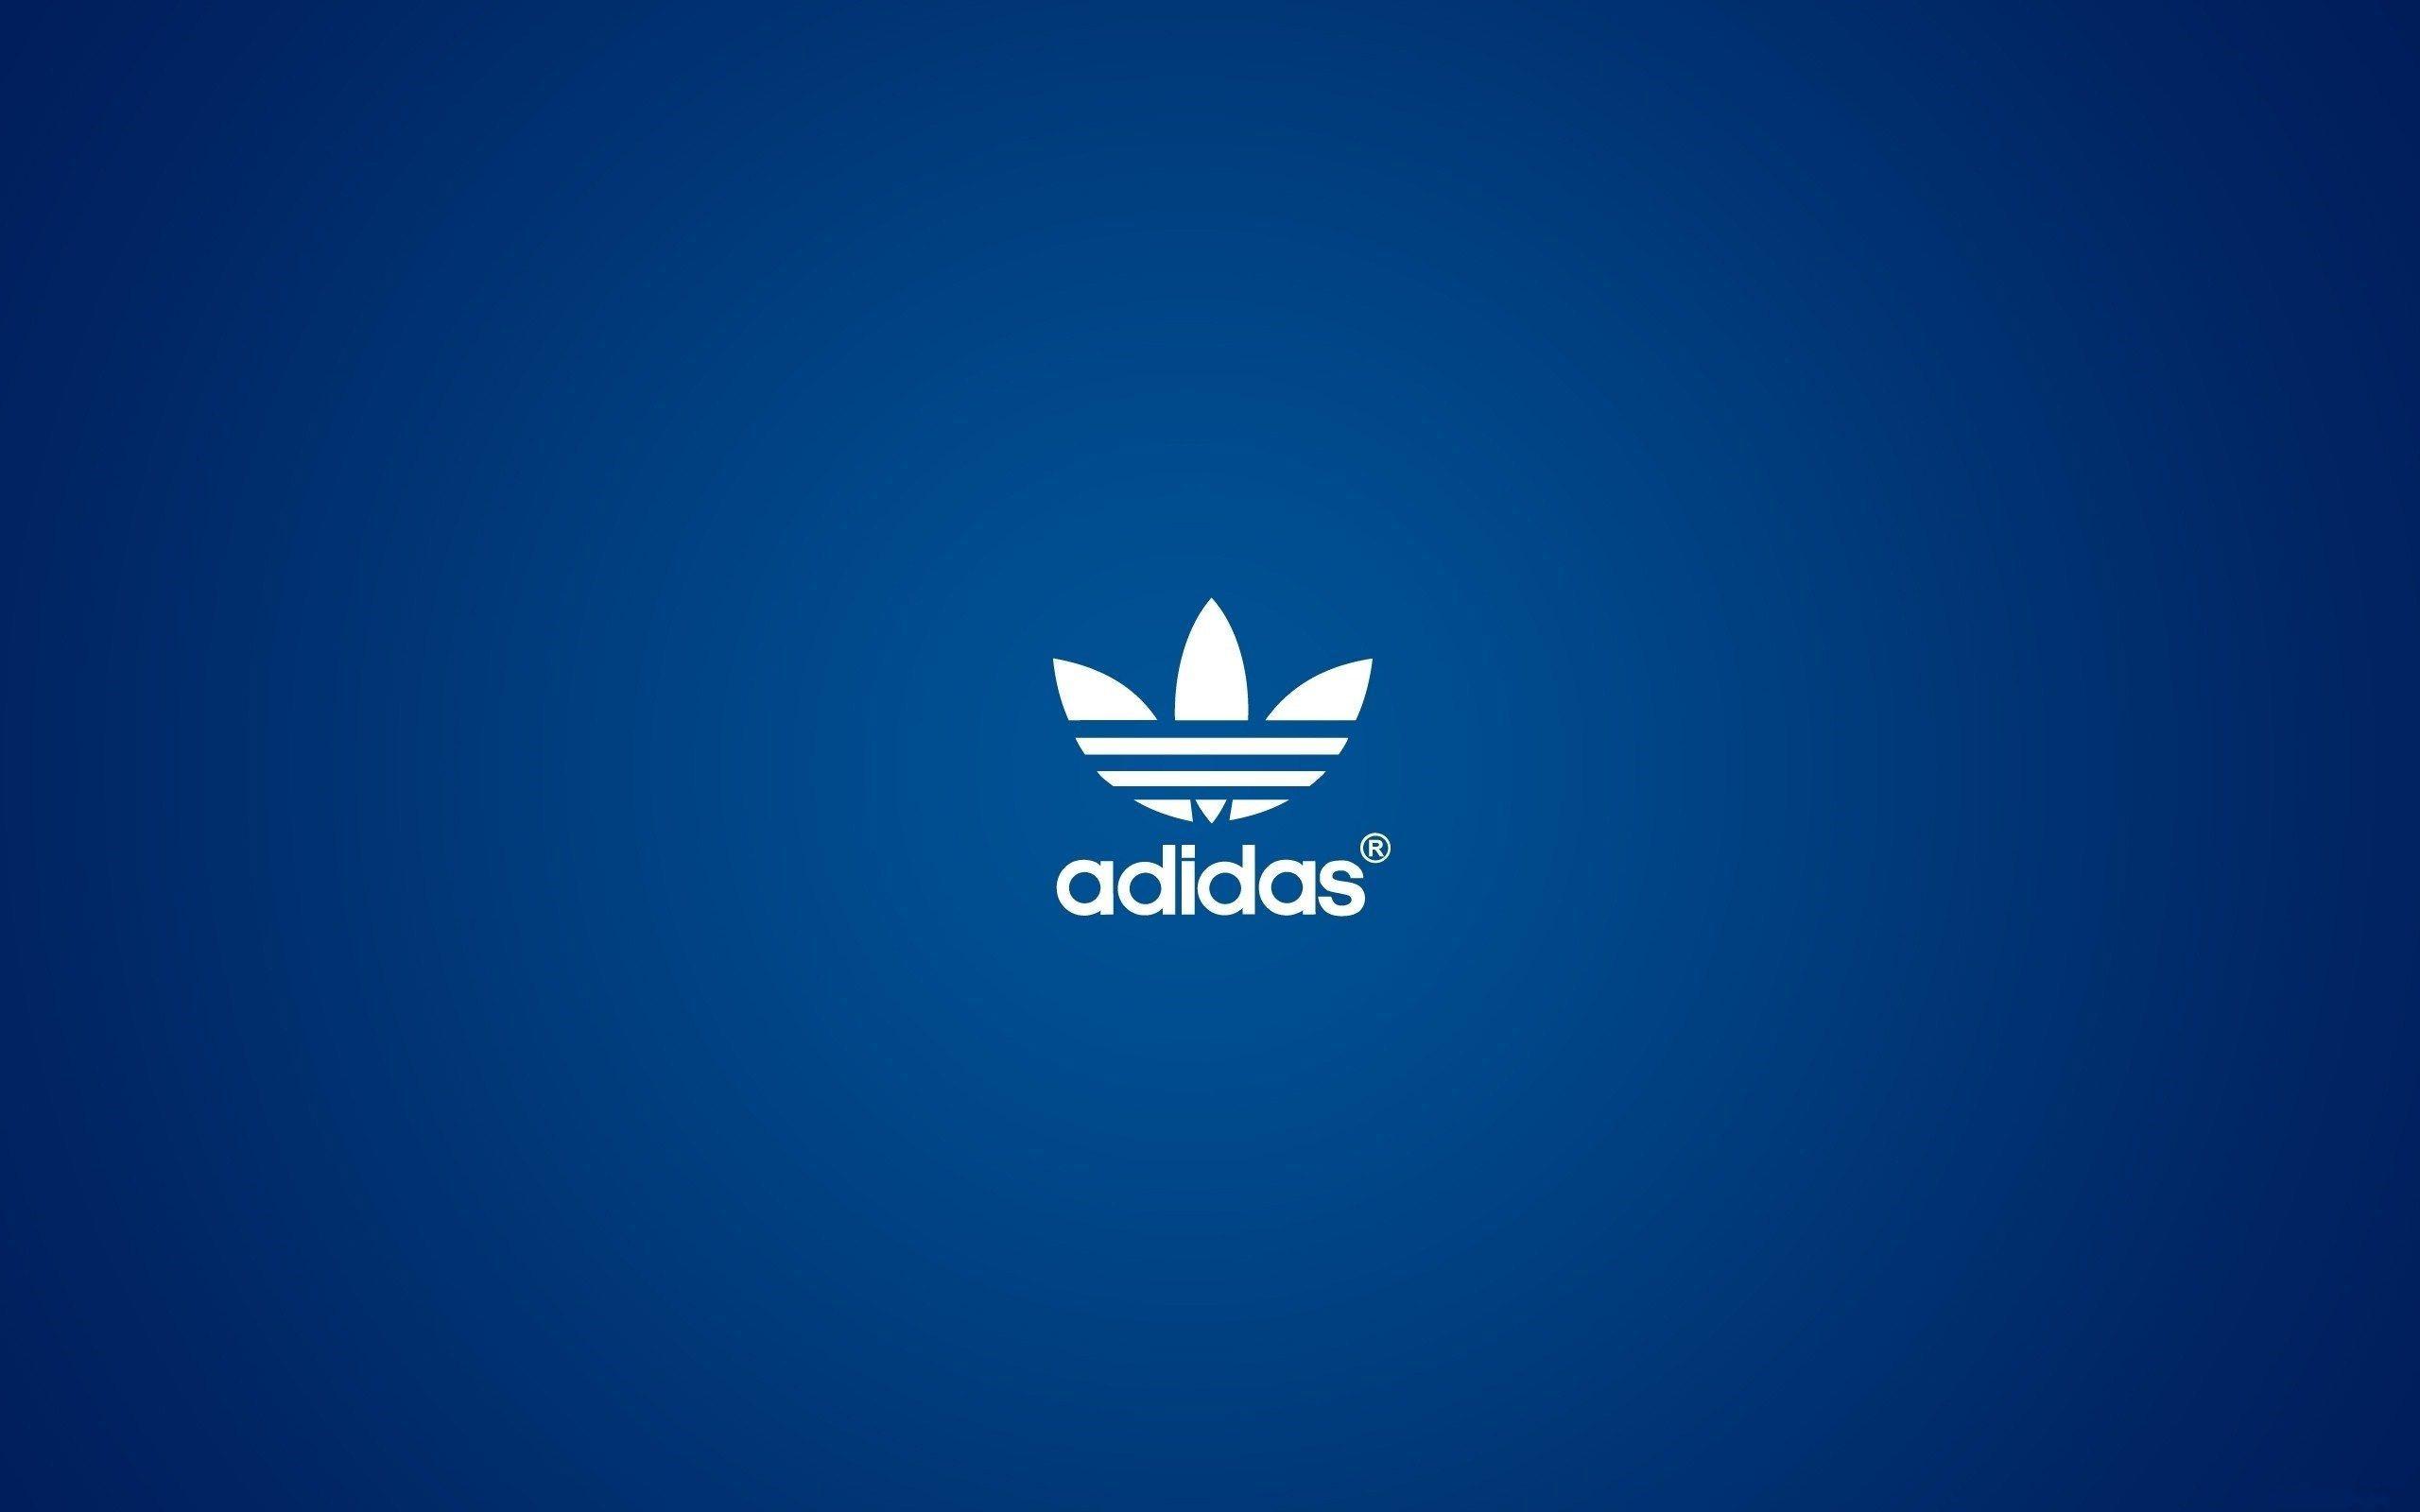 Adidas Logo Wallpapers 2015 - Wallpaper Cave